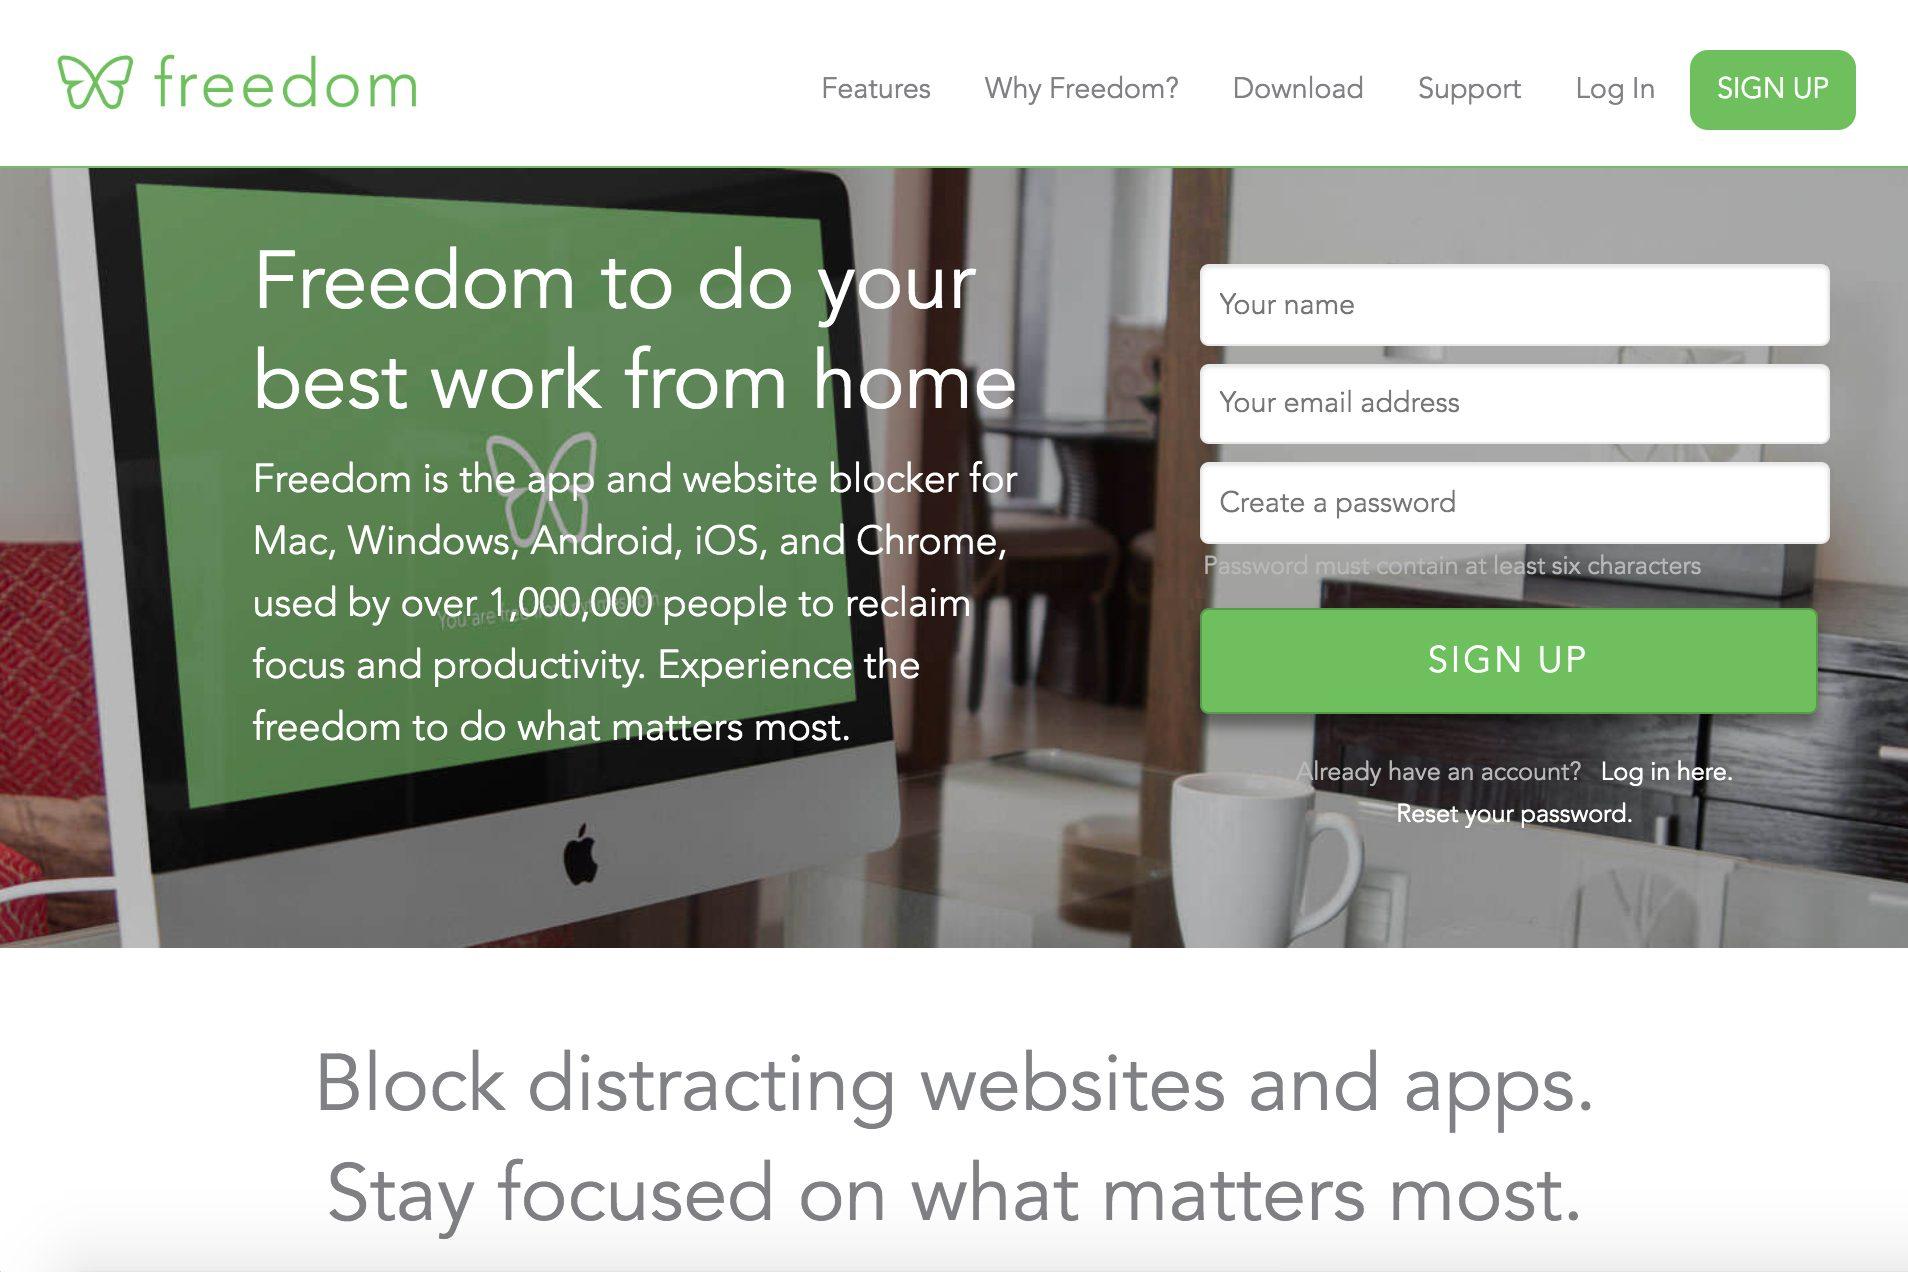 freedom website blocker